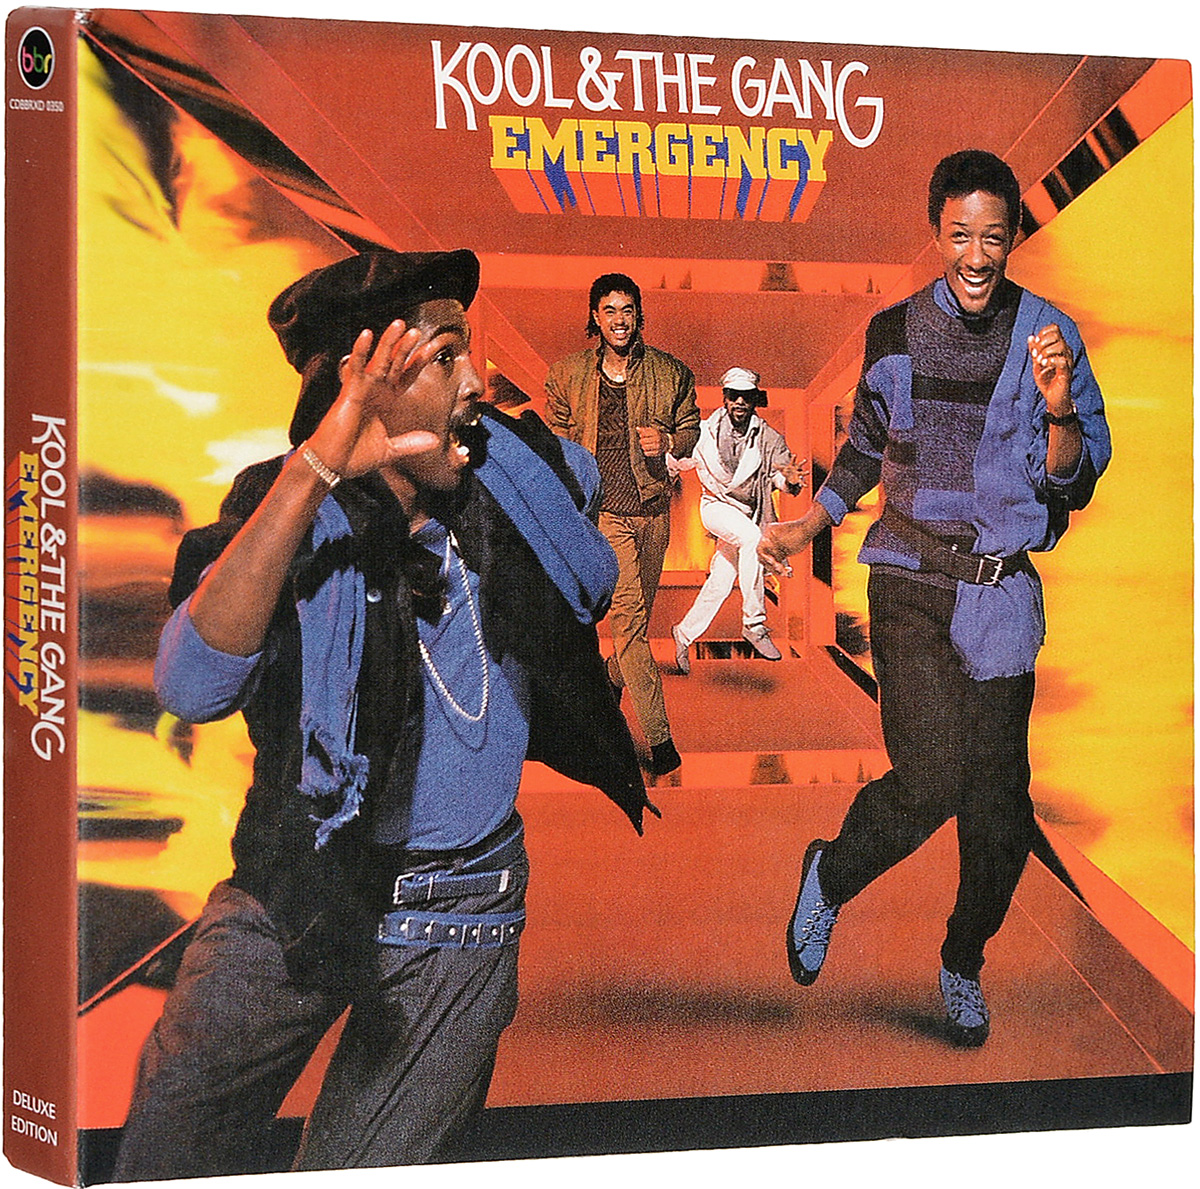 Kool & The Gang Kool & The Gang. Emergency (2 CD) kool